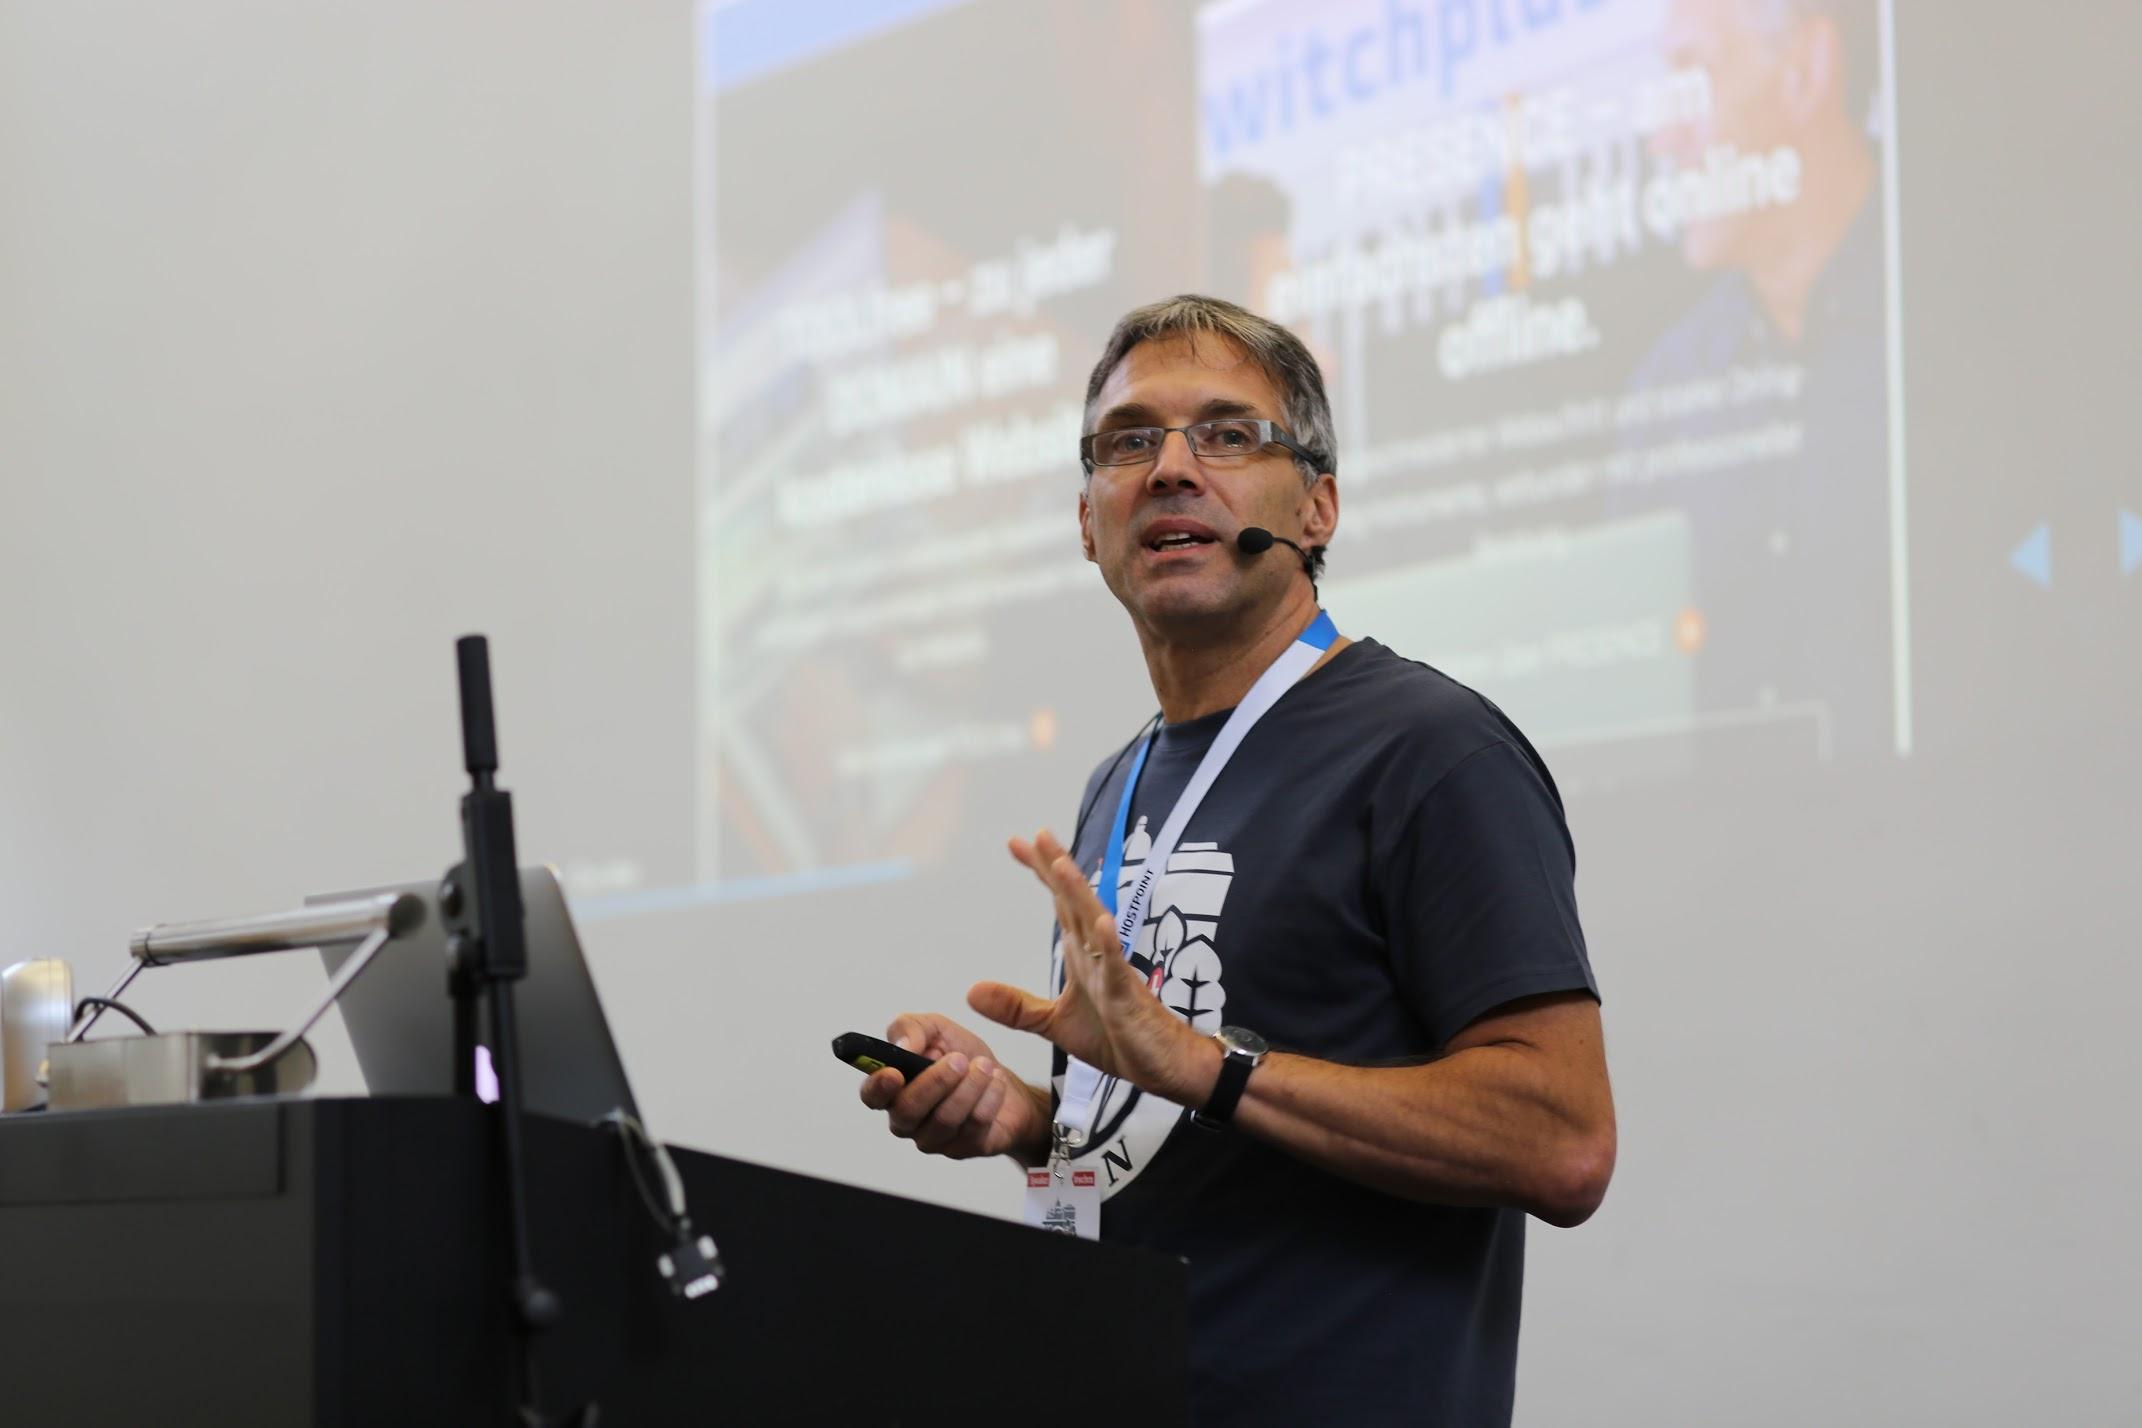 Christian at WordCamp Bern 2017